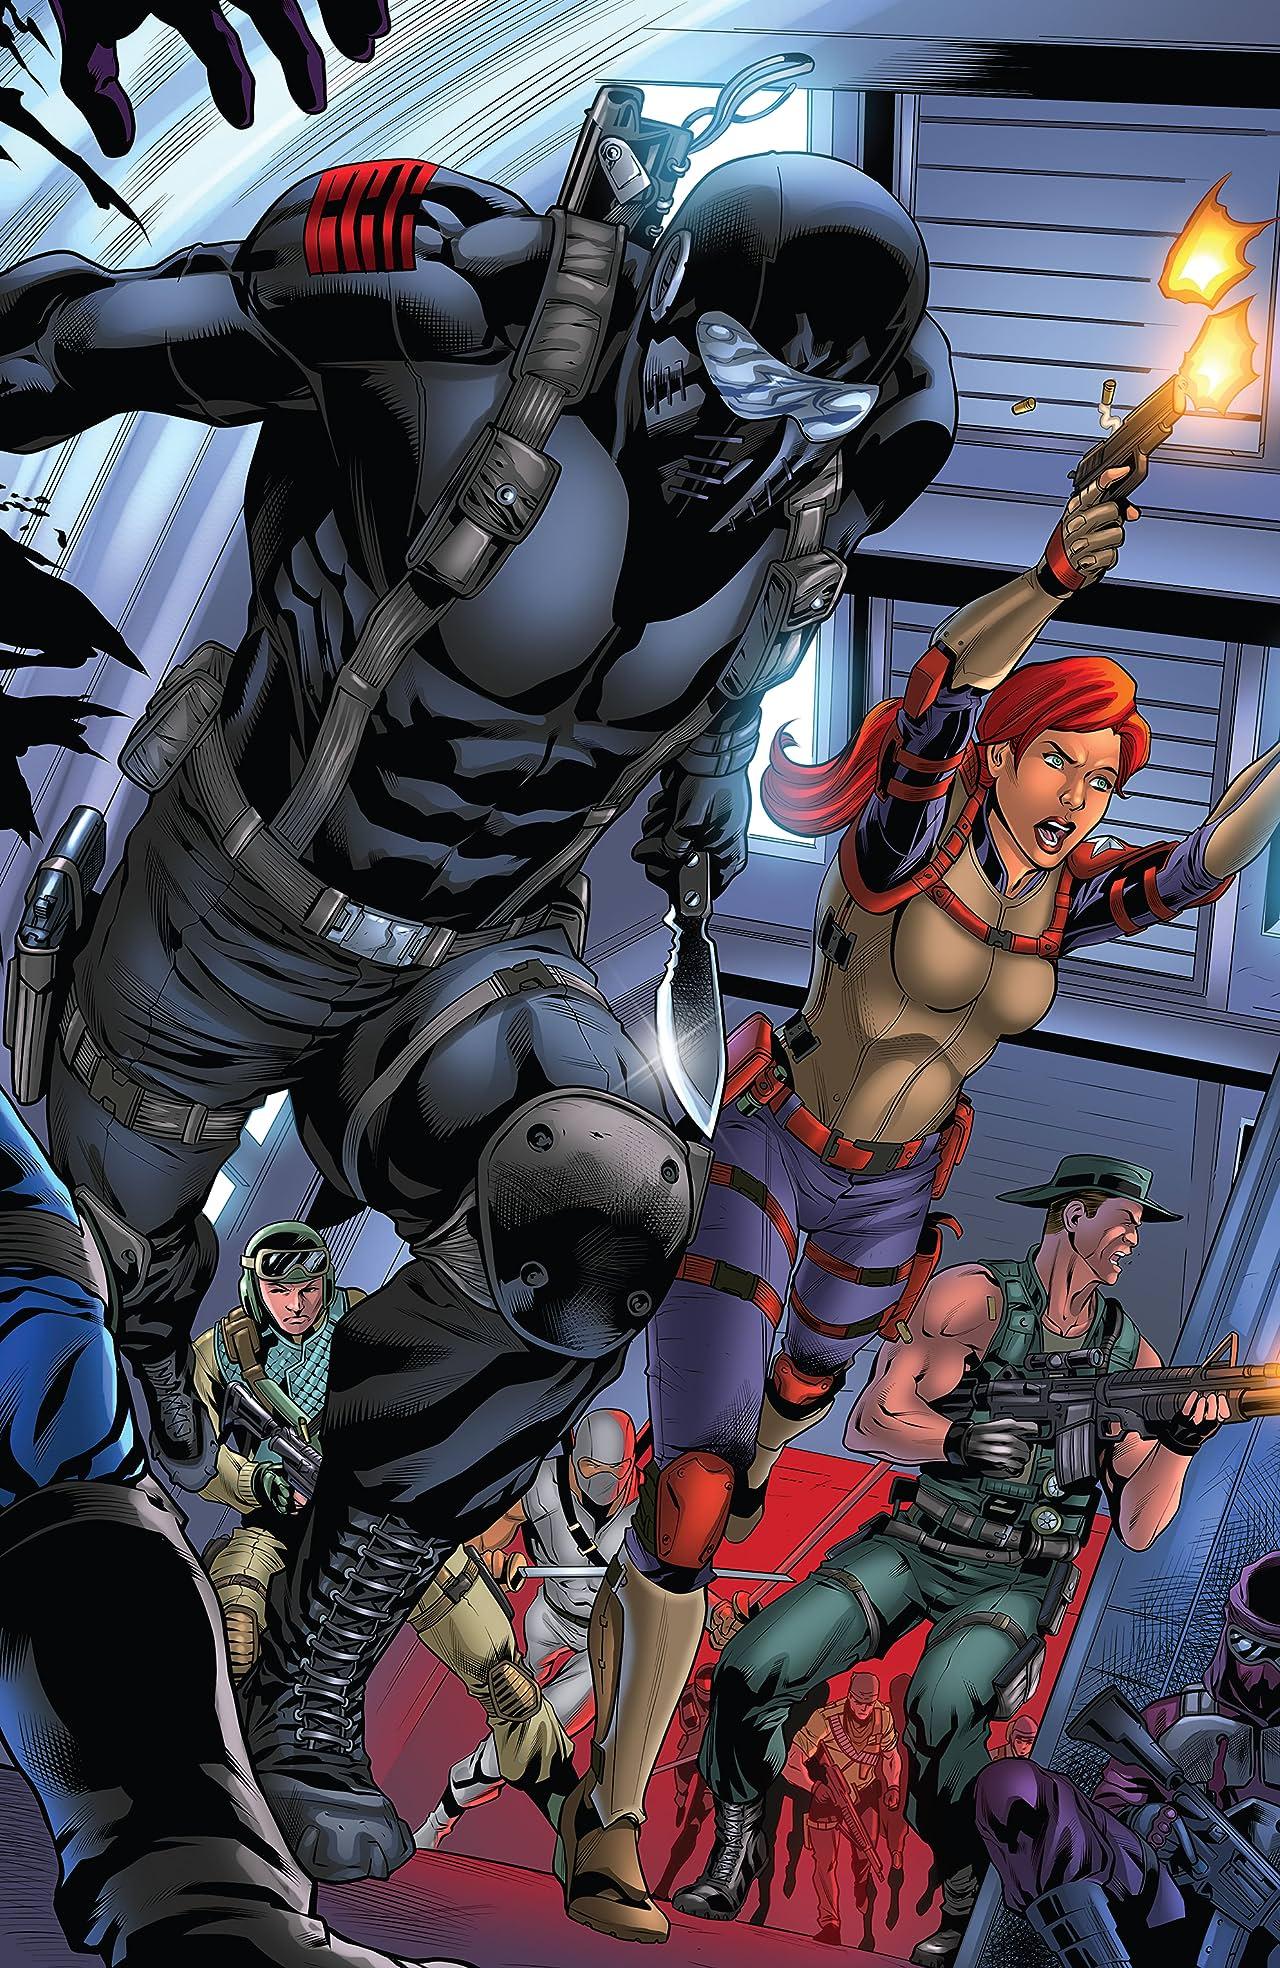 G.I. Joe: A Real American Hero No.275